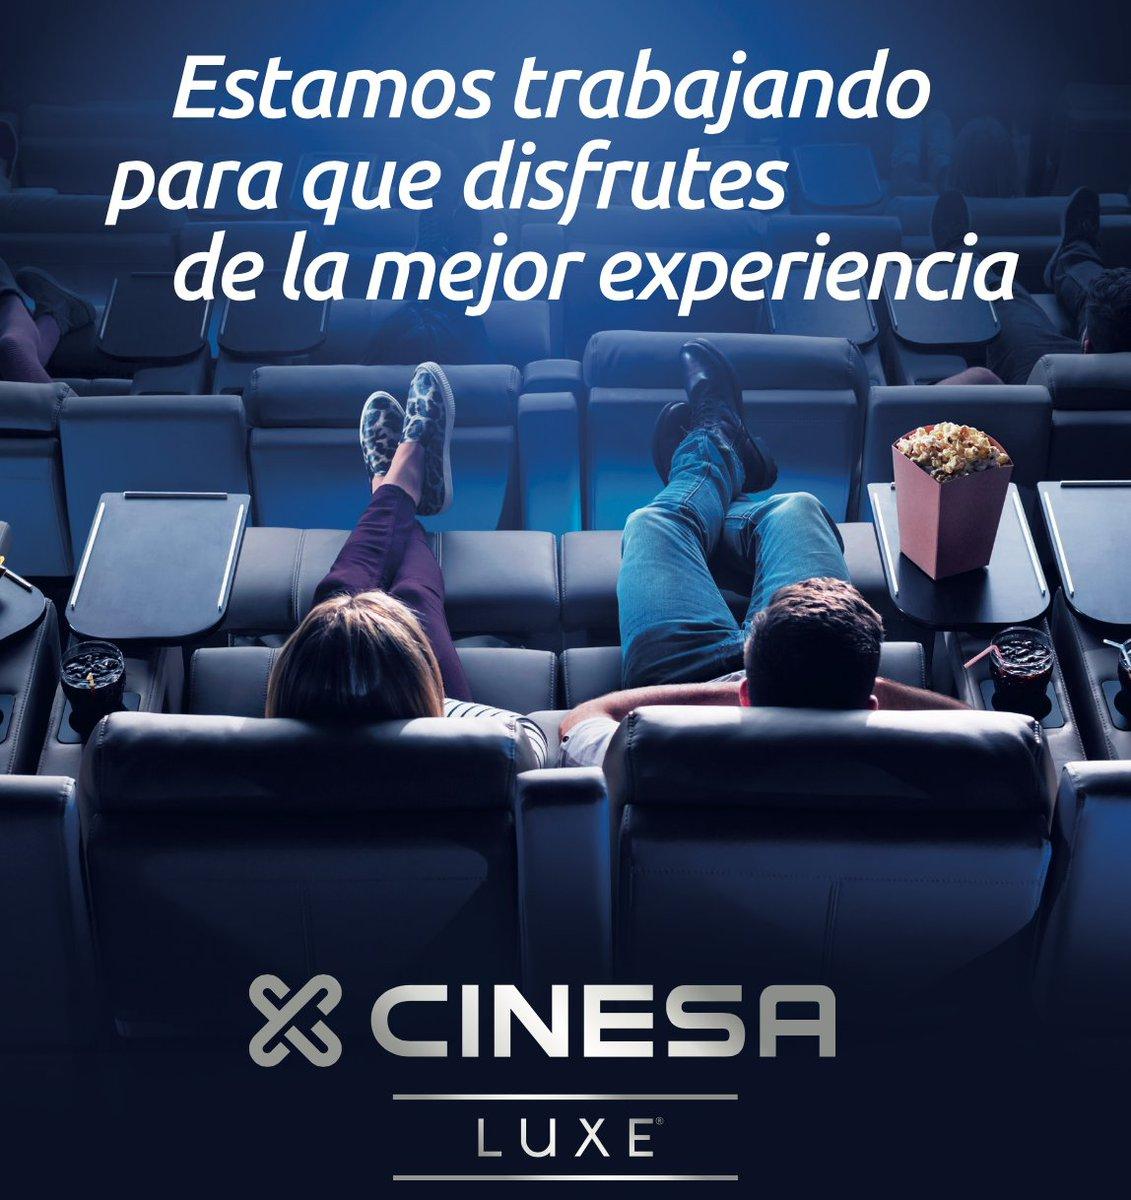 2x1 ENTRADAS CINESA (RECOMENDABLE XANADU)